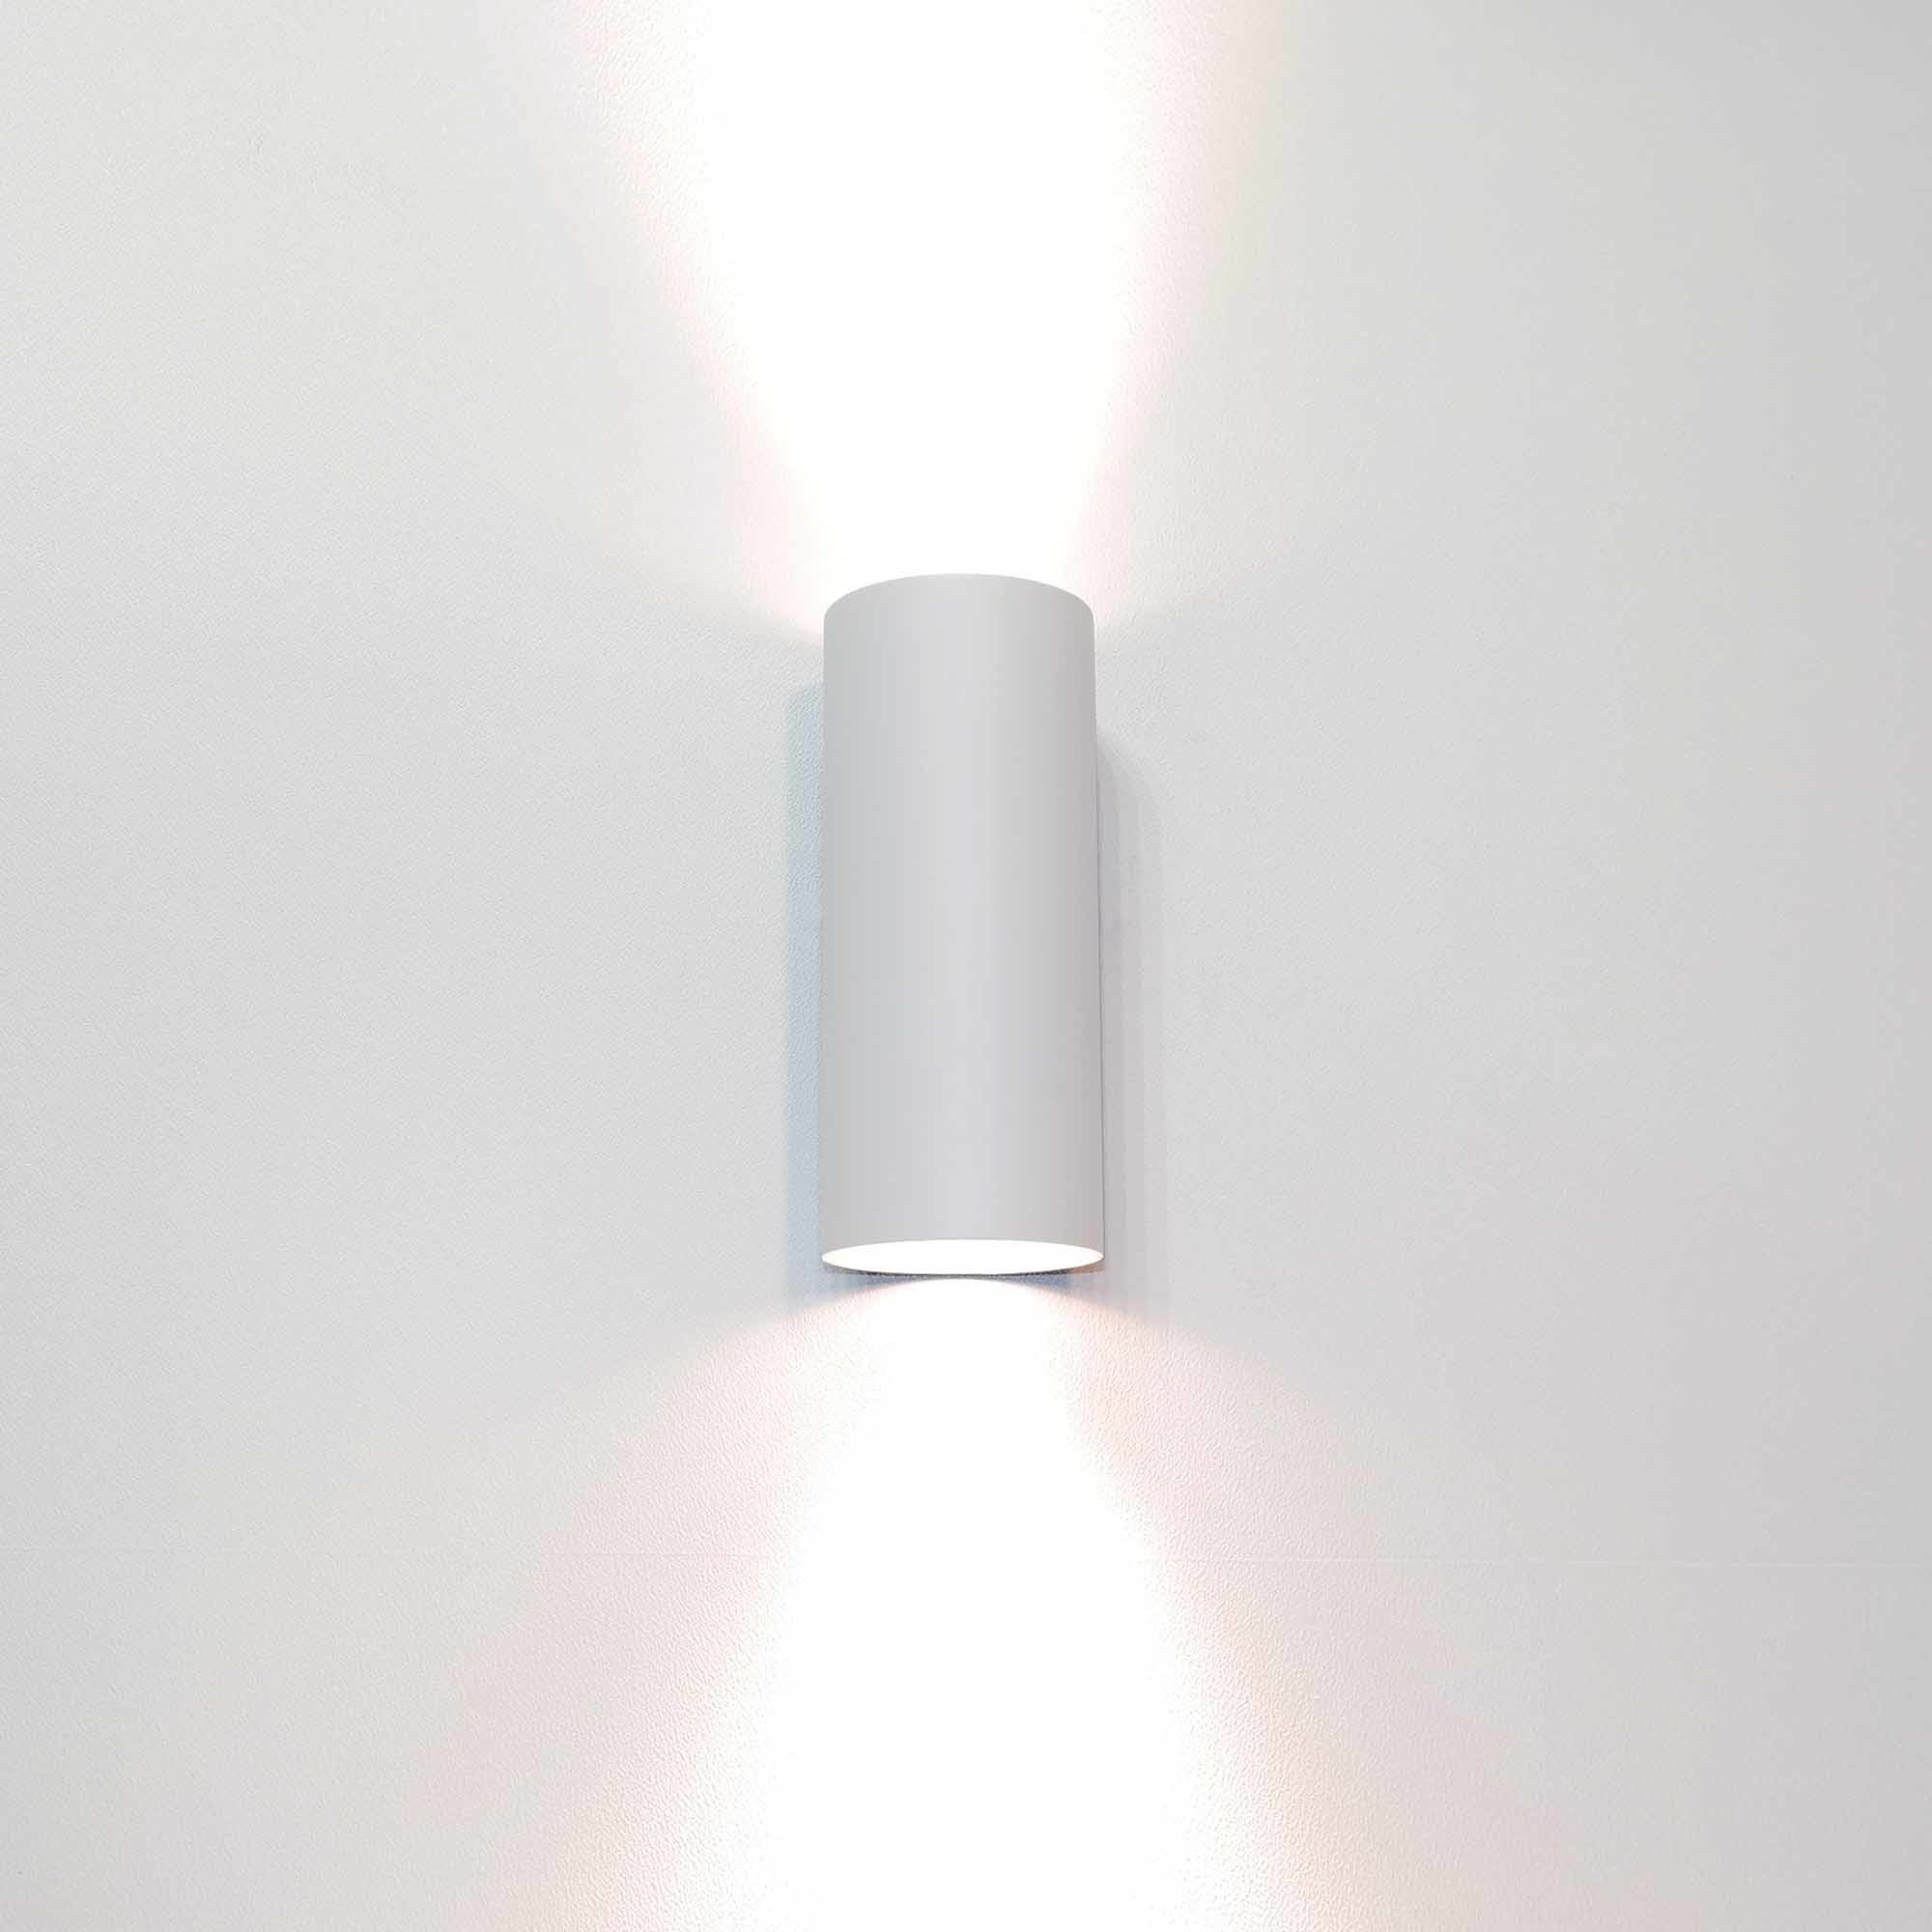 Artdelight Wandlamp Roulo 2 lichts H 15,4 Ø 6,5 cm wit